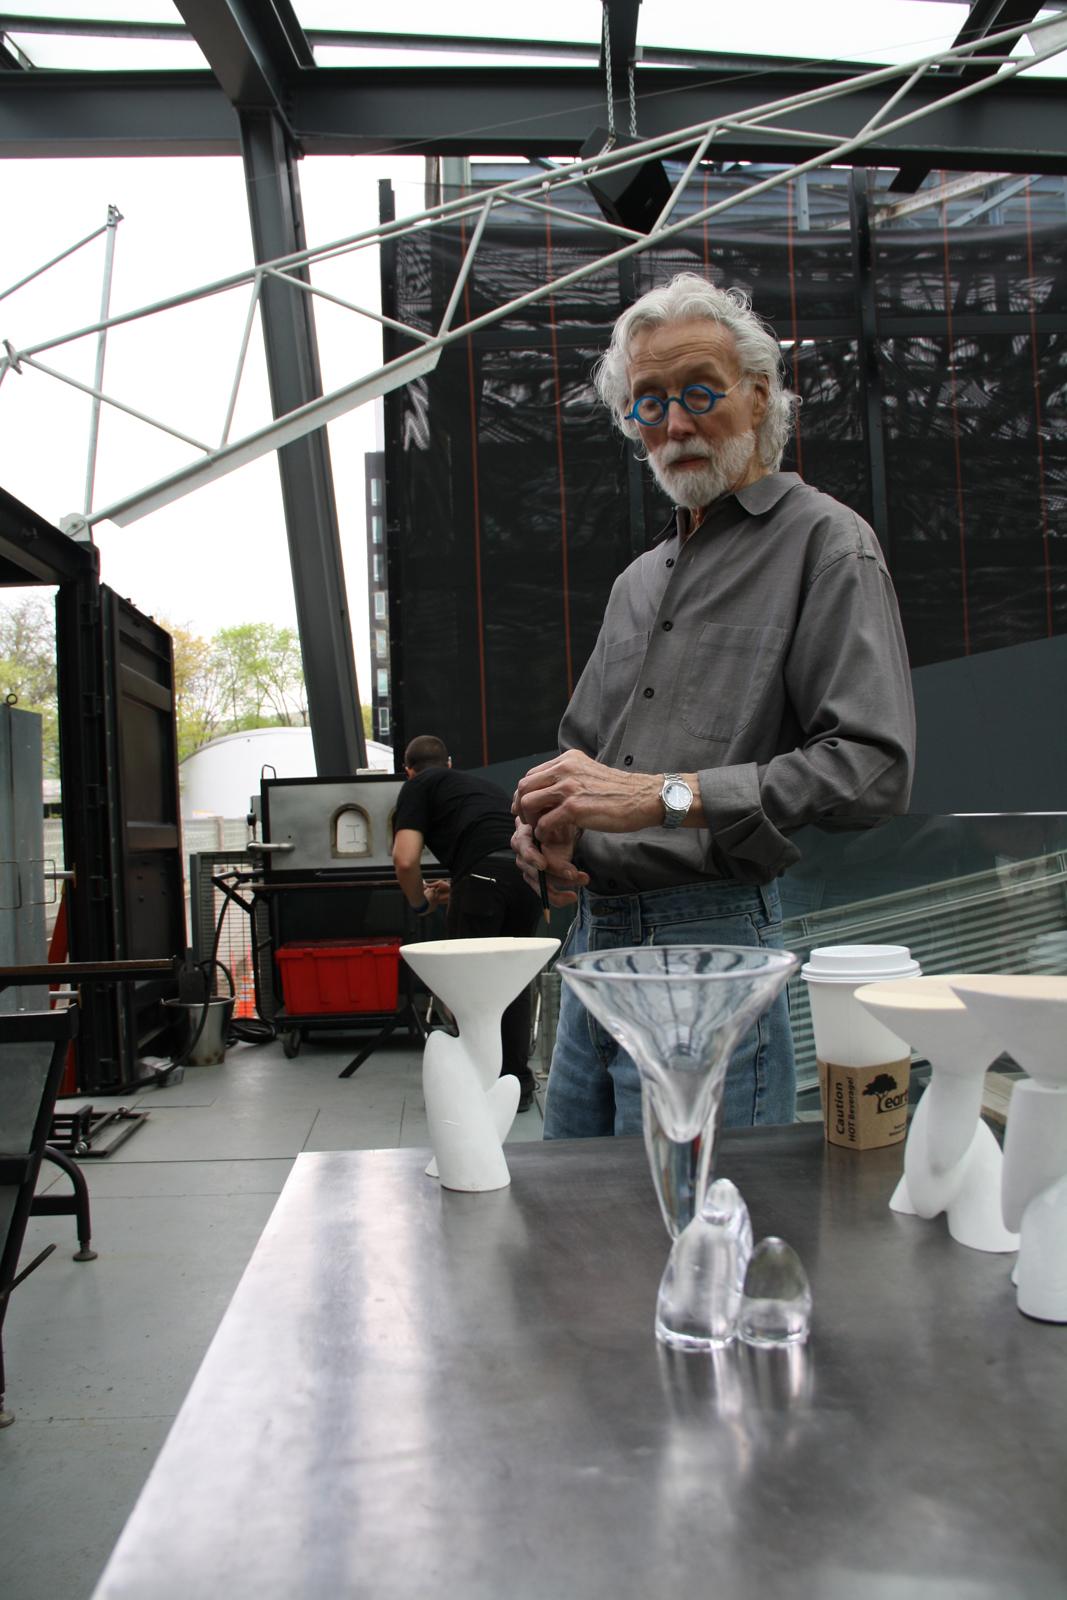 Designer Wendell Castle in a GlassLab design session in Corning, May, 2013